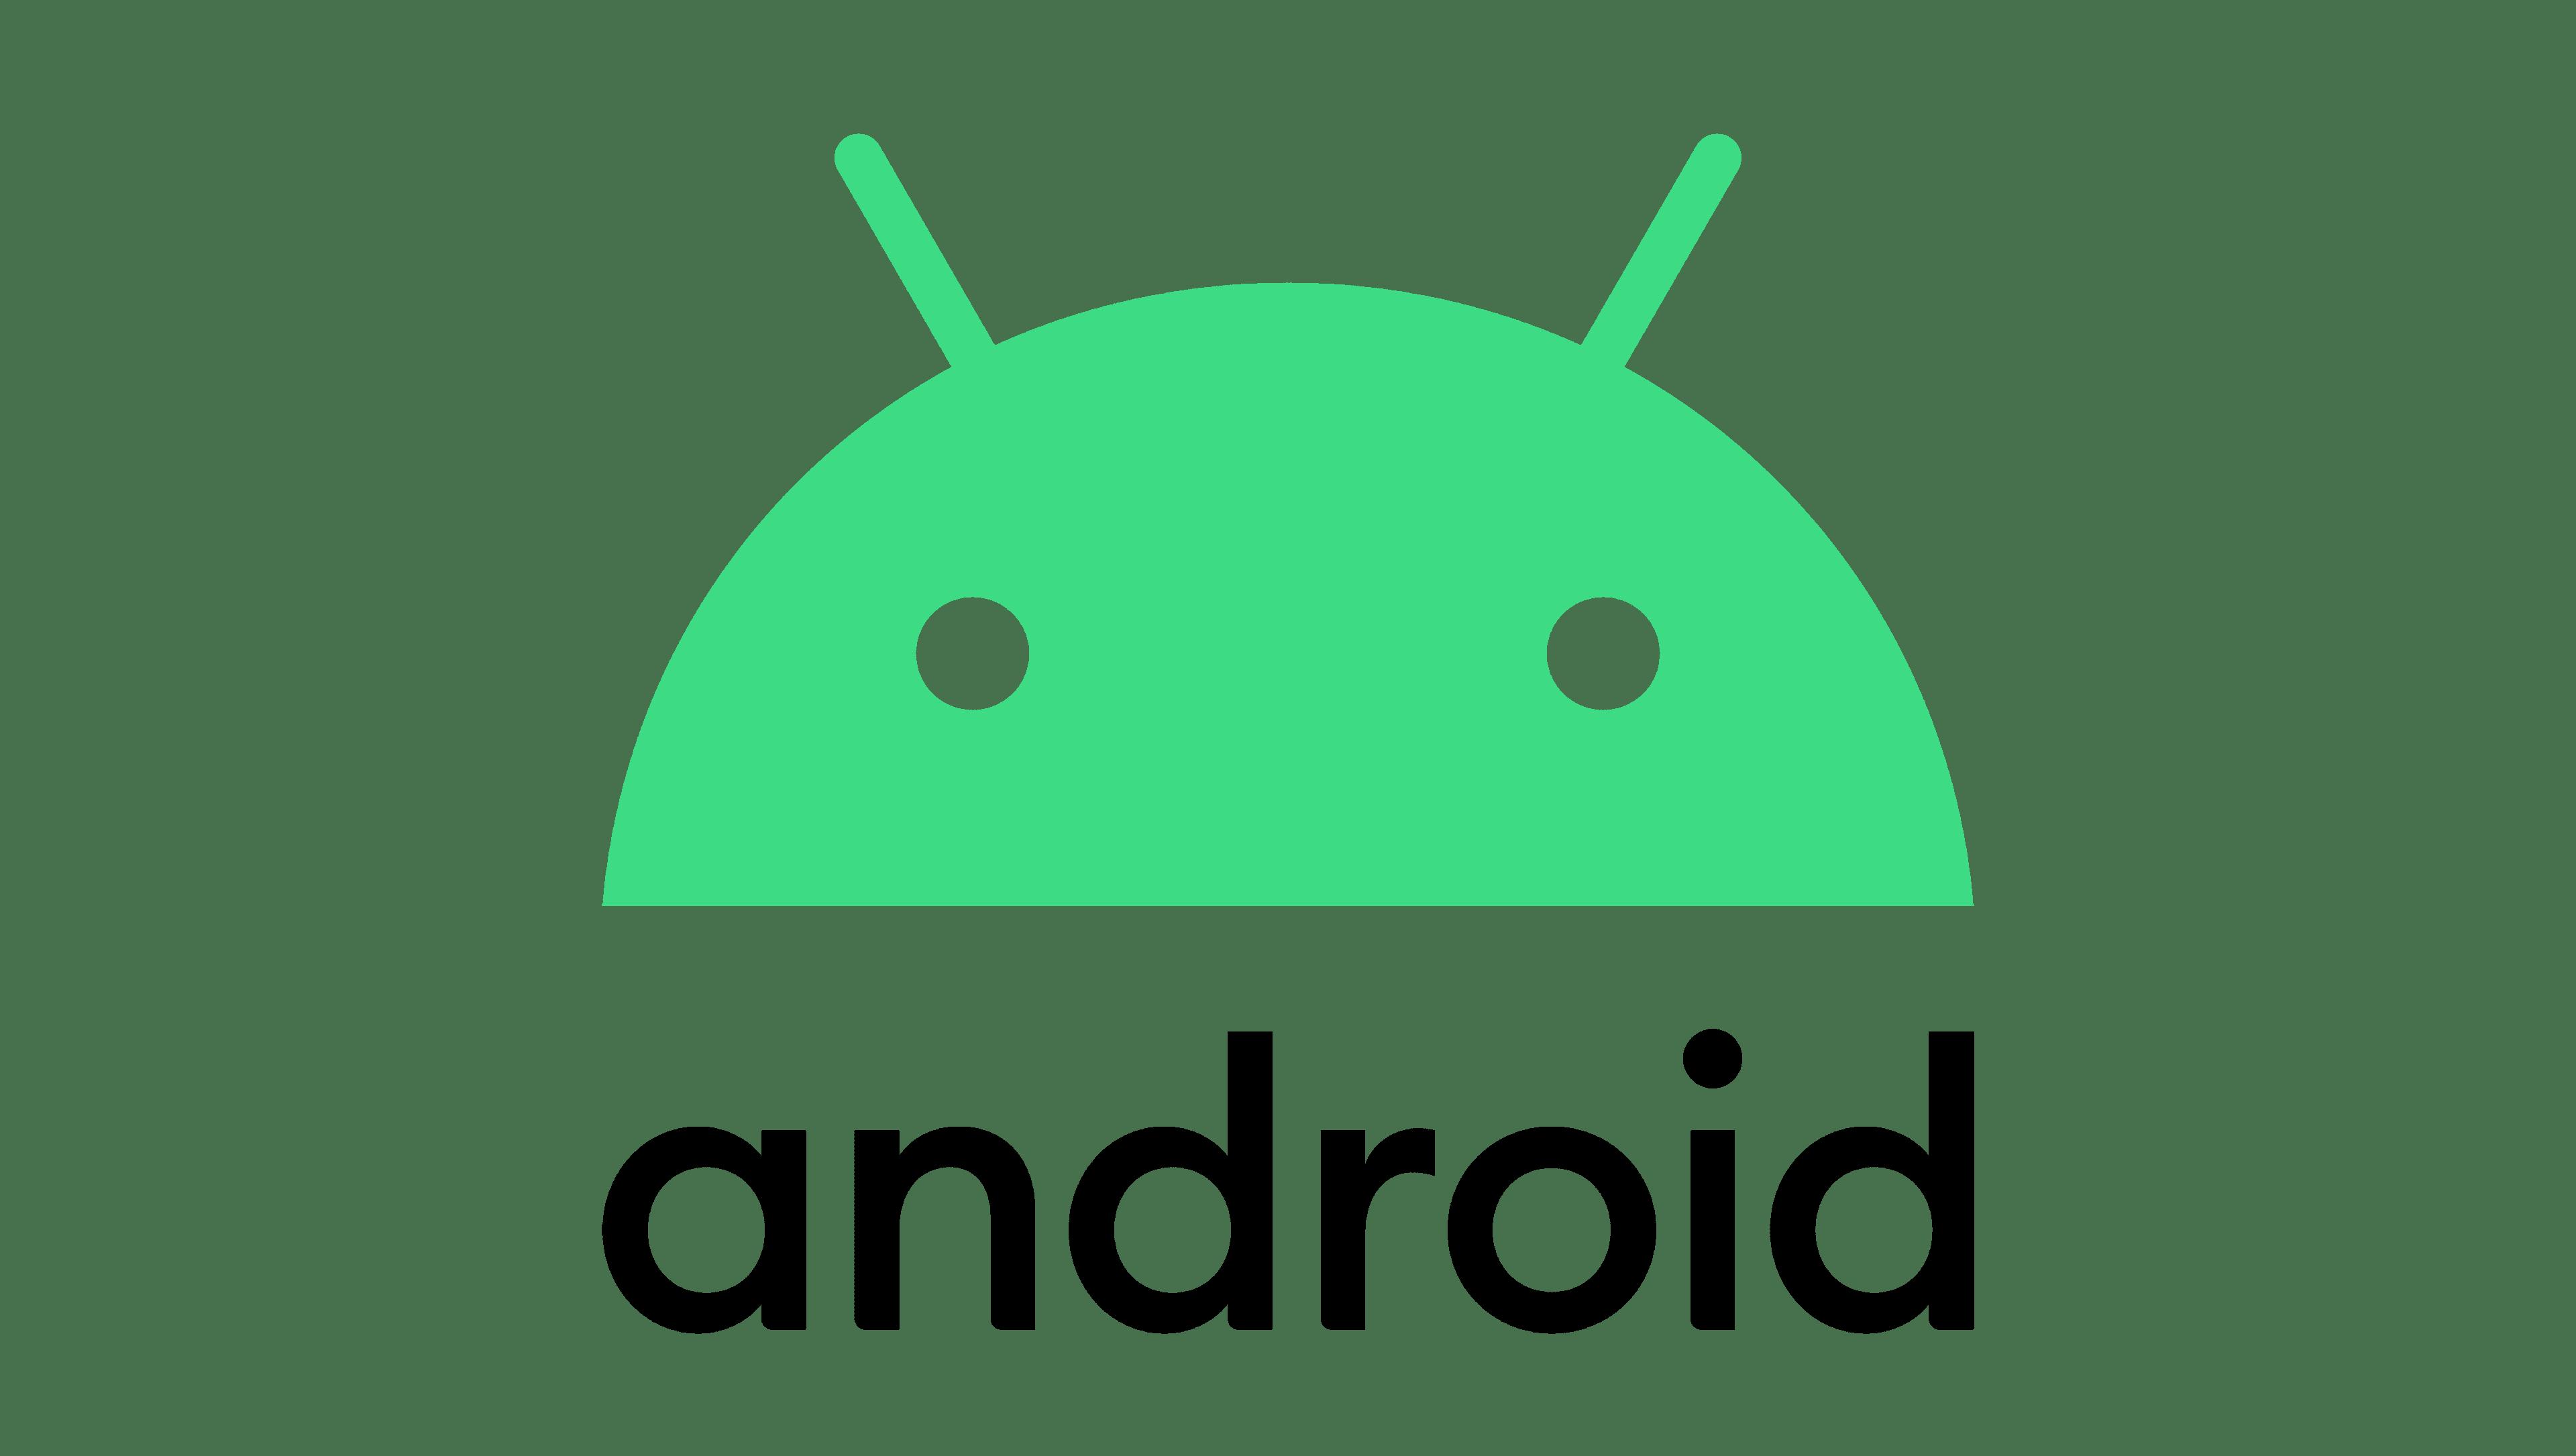 La marque Android certifie Koesio